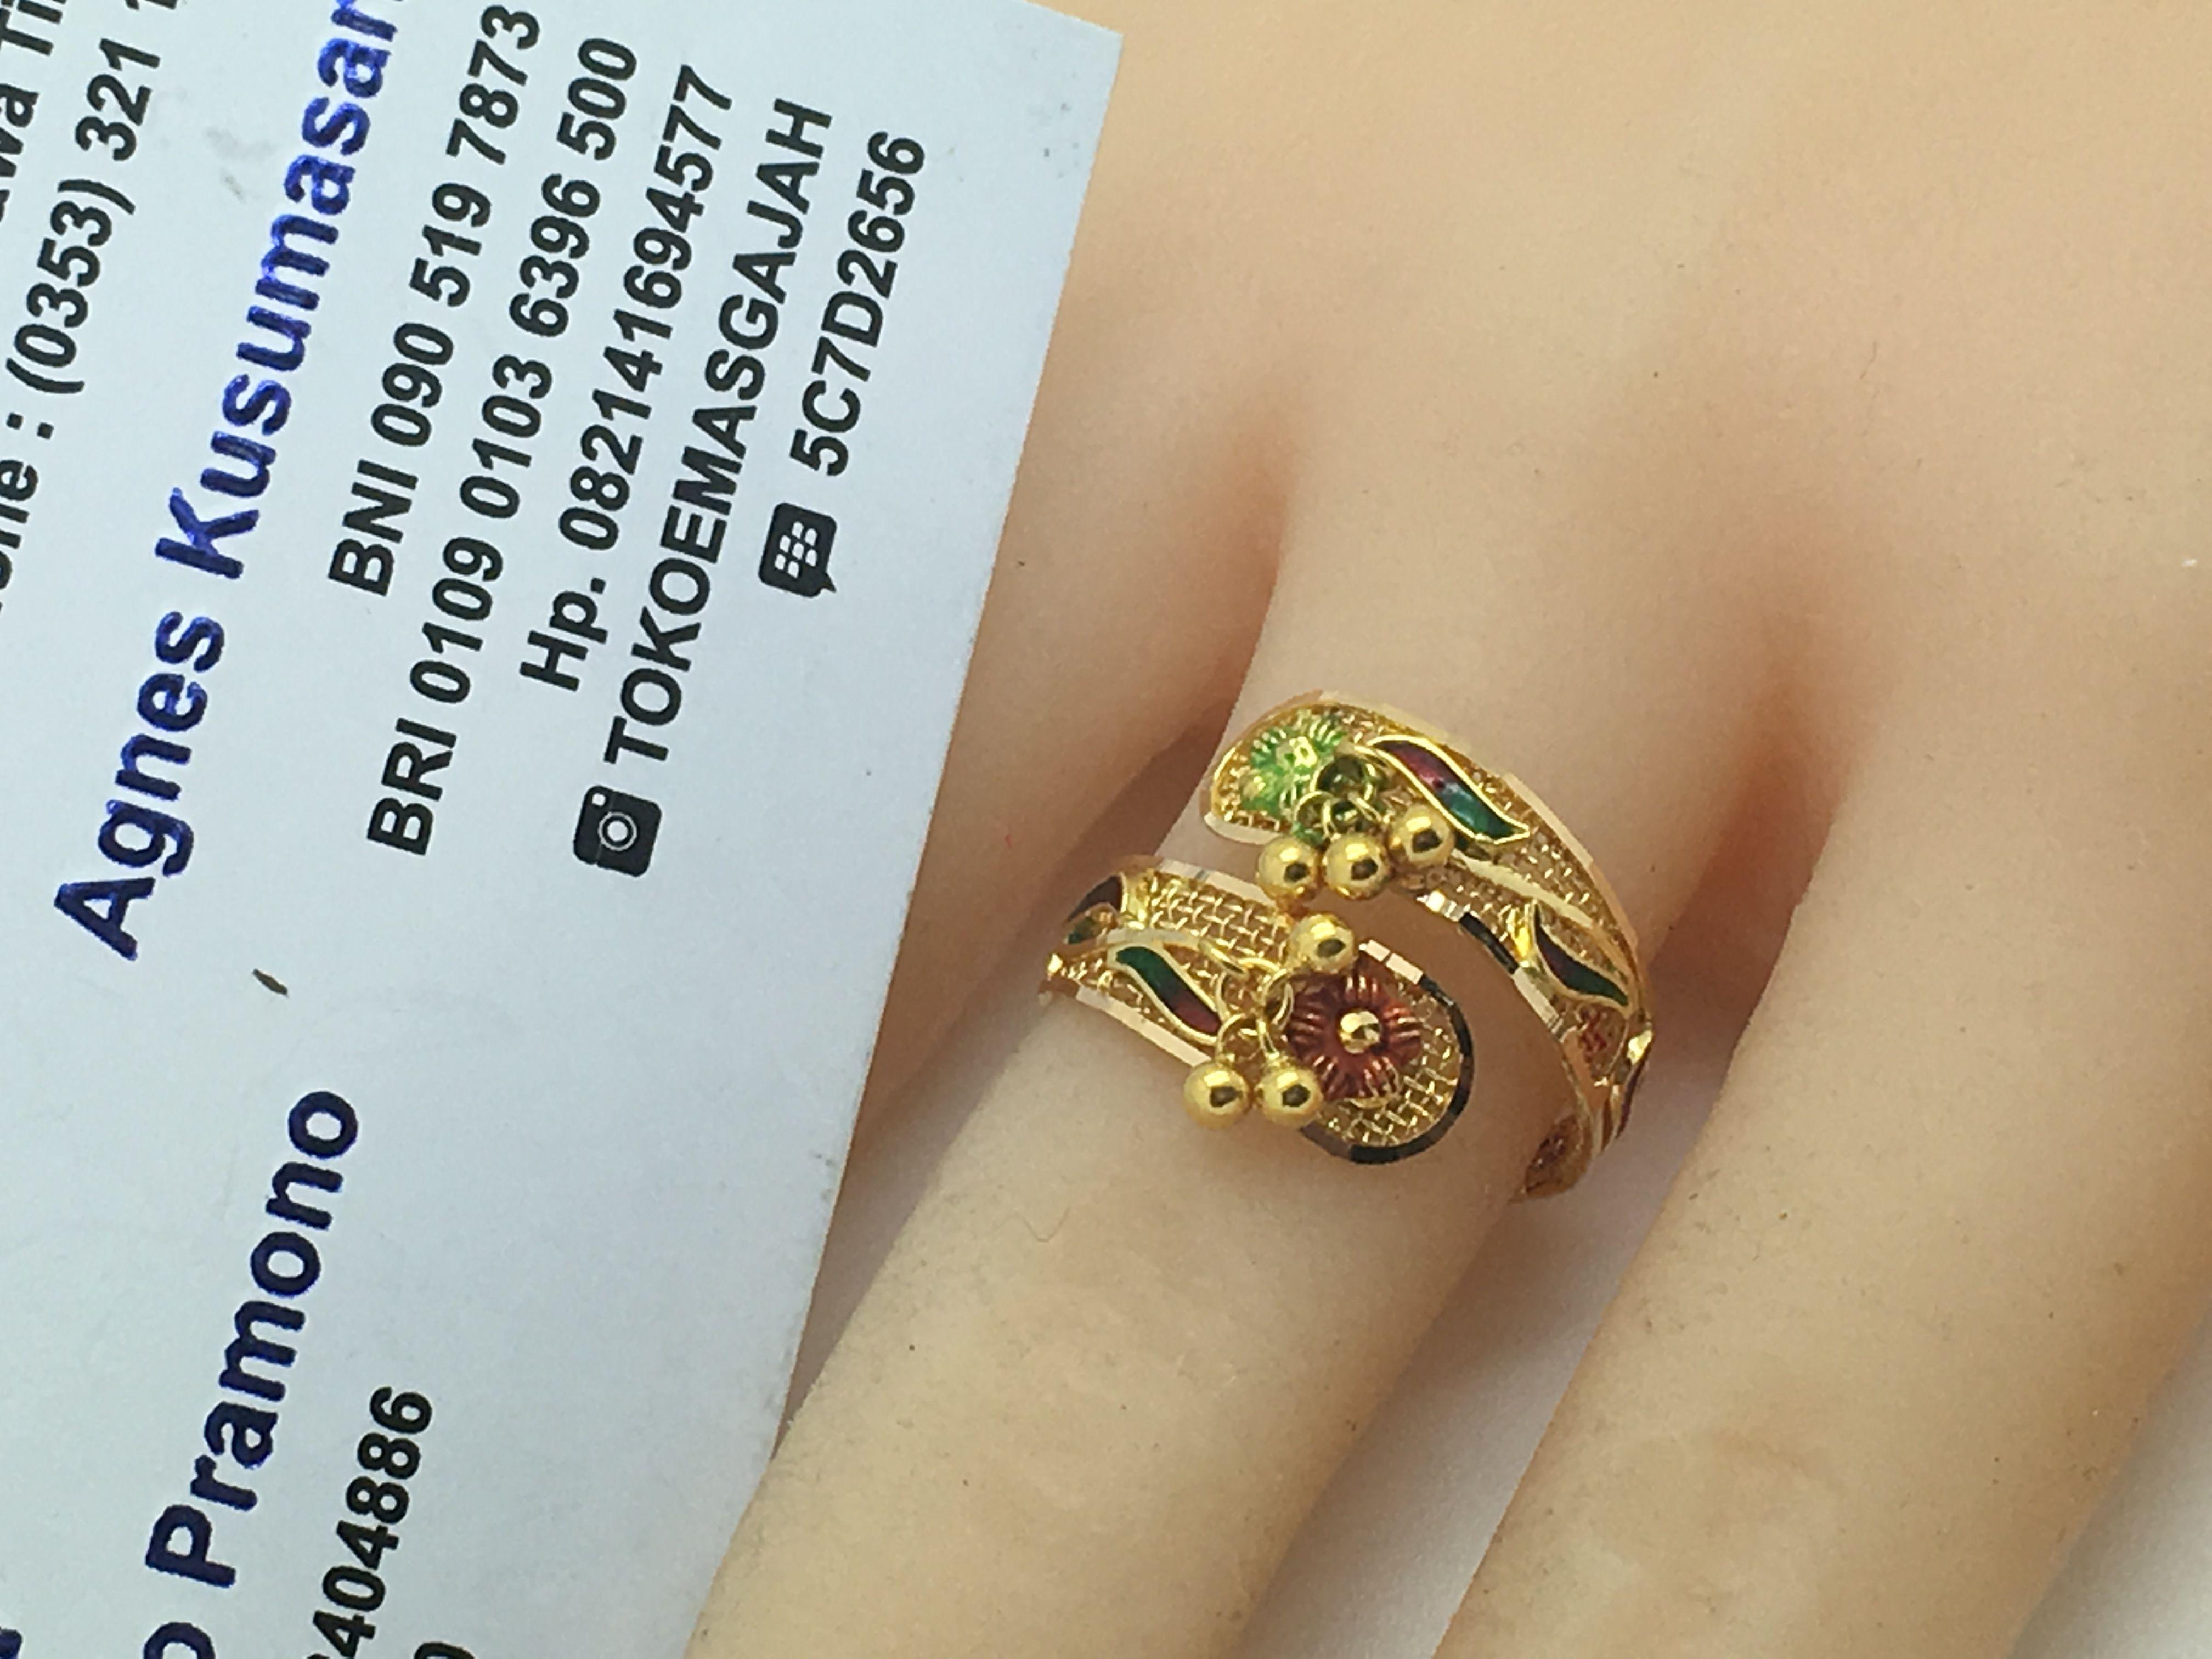 22k / 91,6% Gold Dubai / India Swirl Ring adujustable size | 22k ...